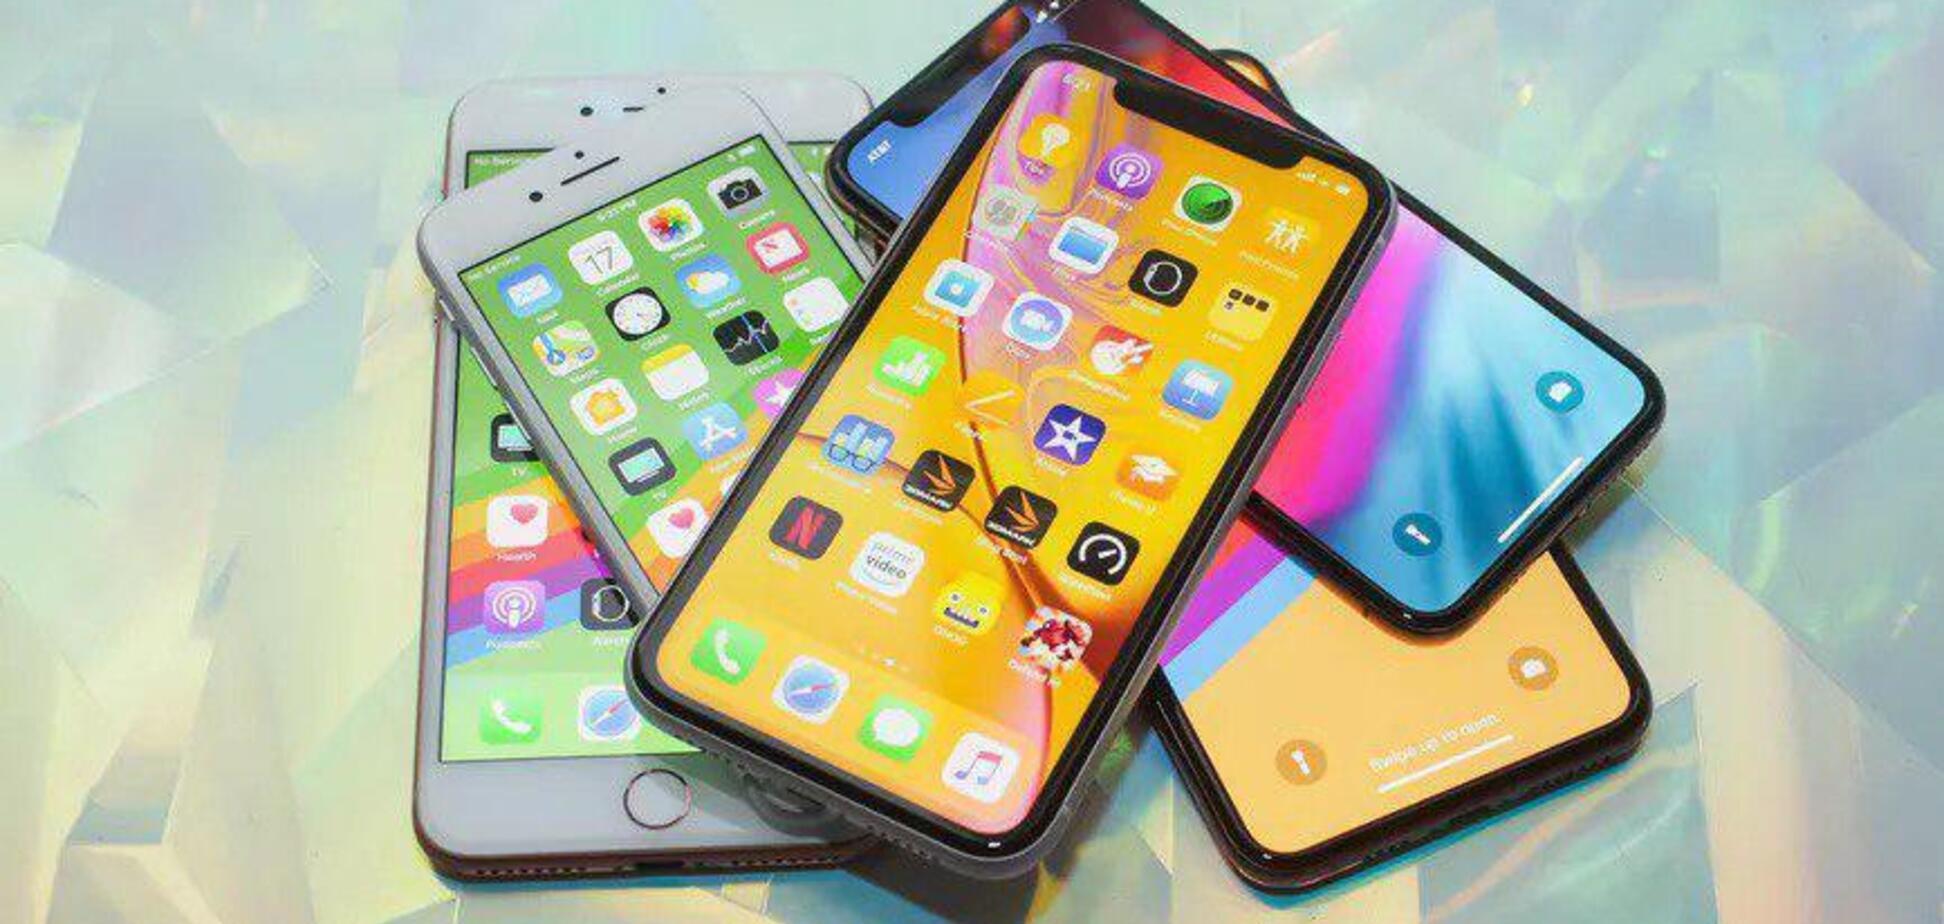 Правда или вымысел: три мифа о самом обсуждаемом iPhone года